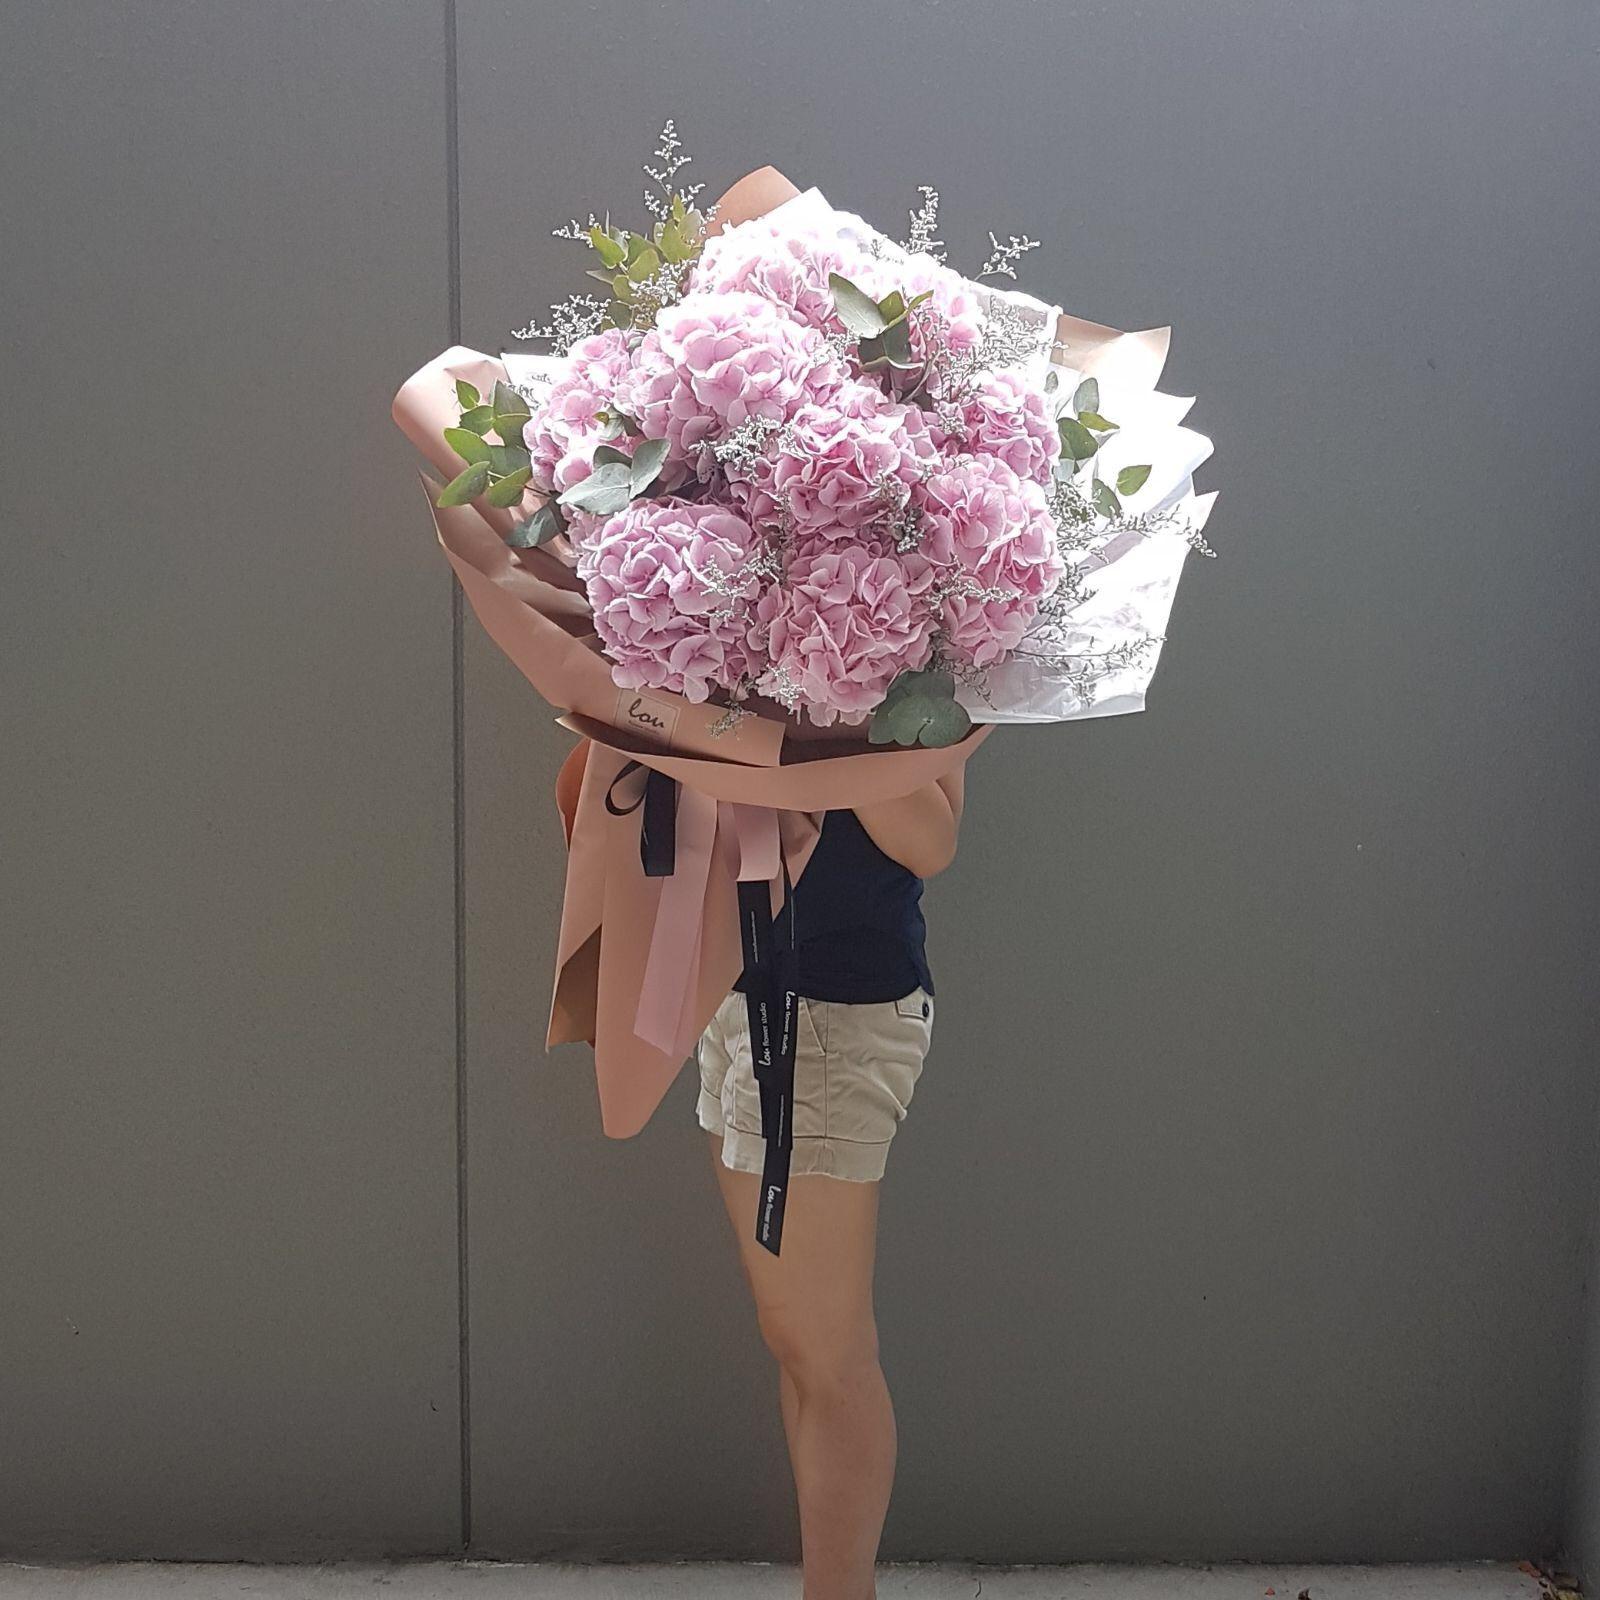 Giant Bouquet Of Pink Hydrangea Pink Hydrangea Bouquet Pink Hydrangea Hydrangea Bouquet